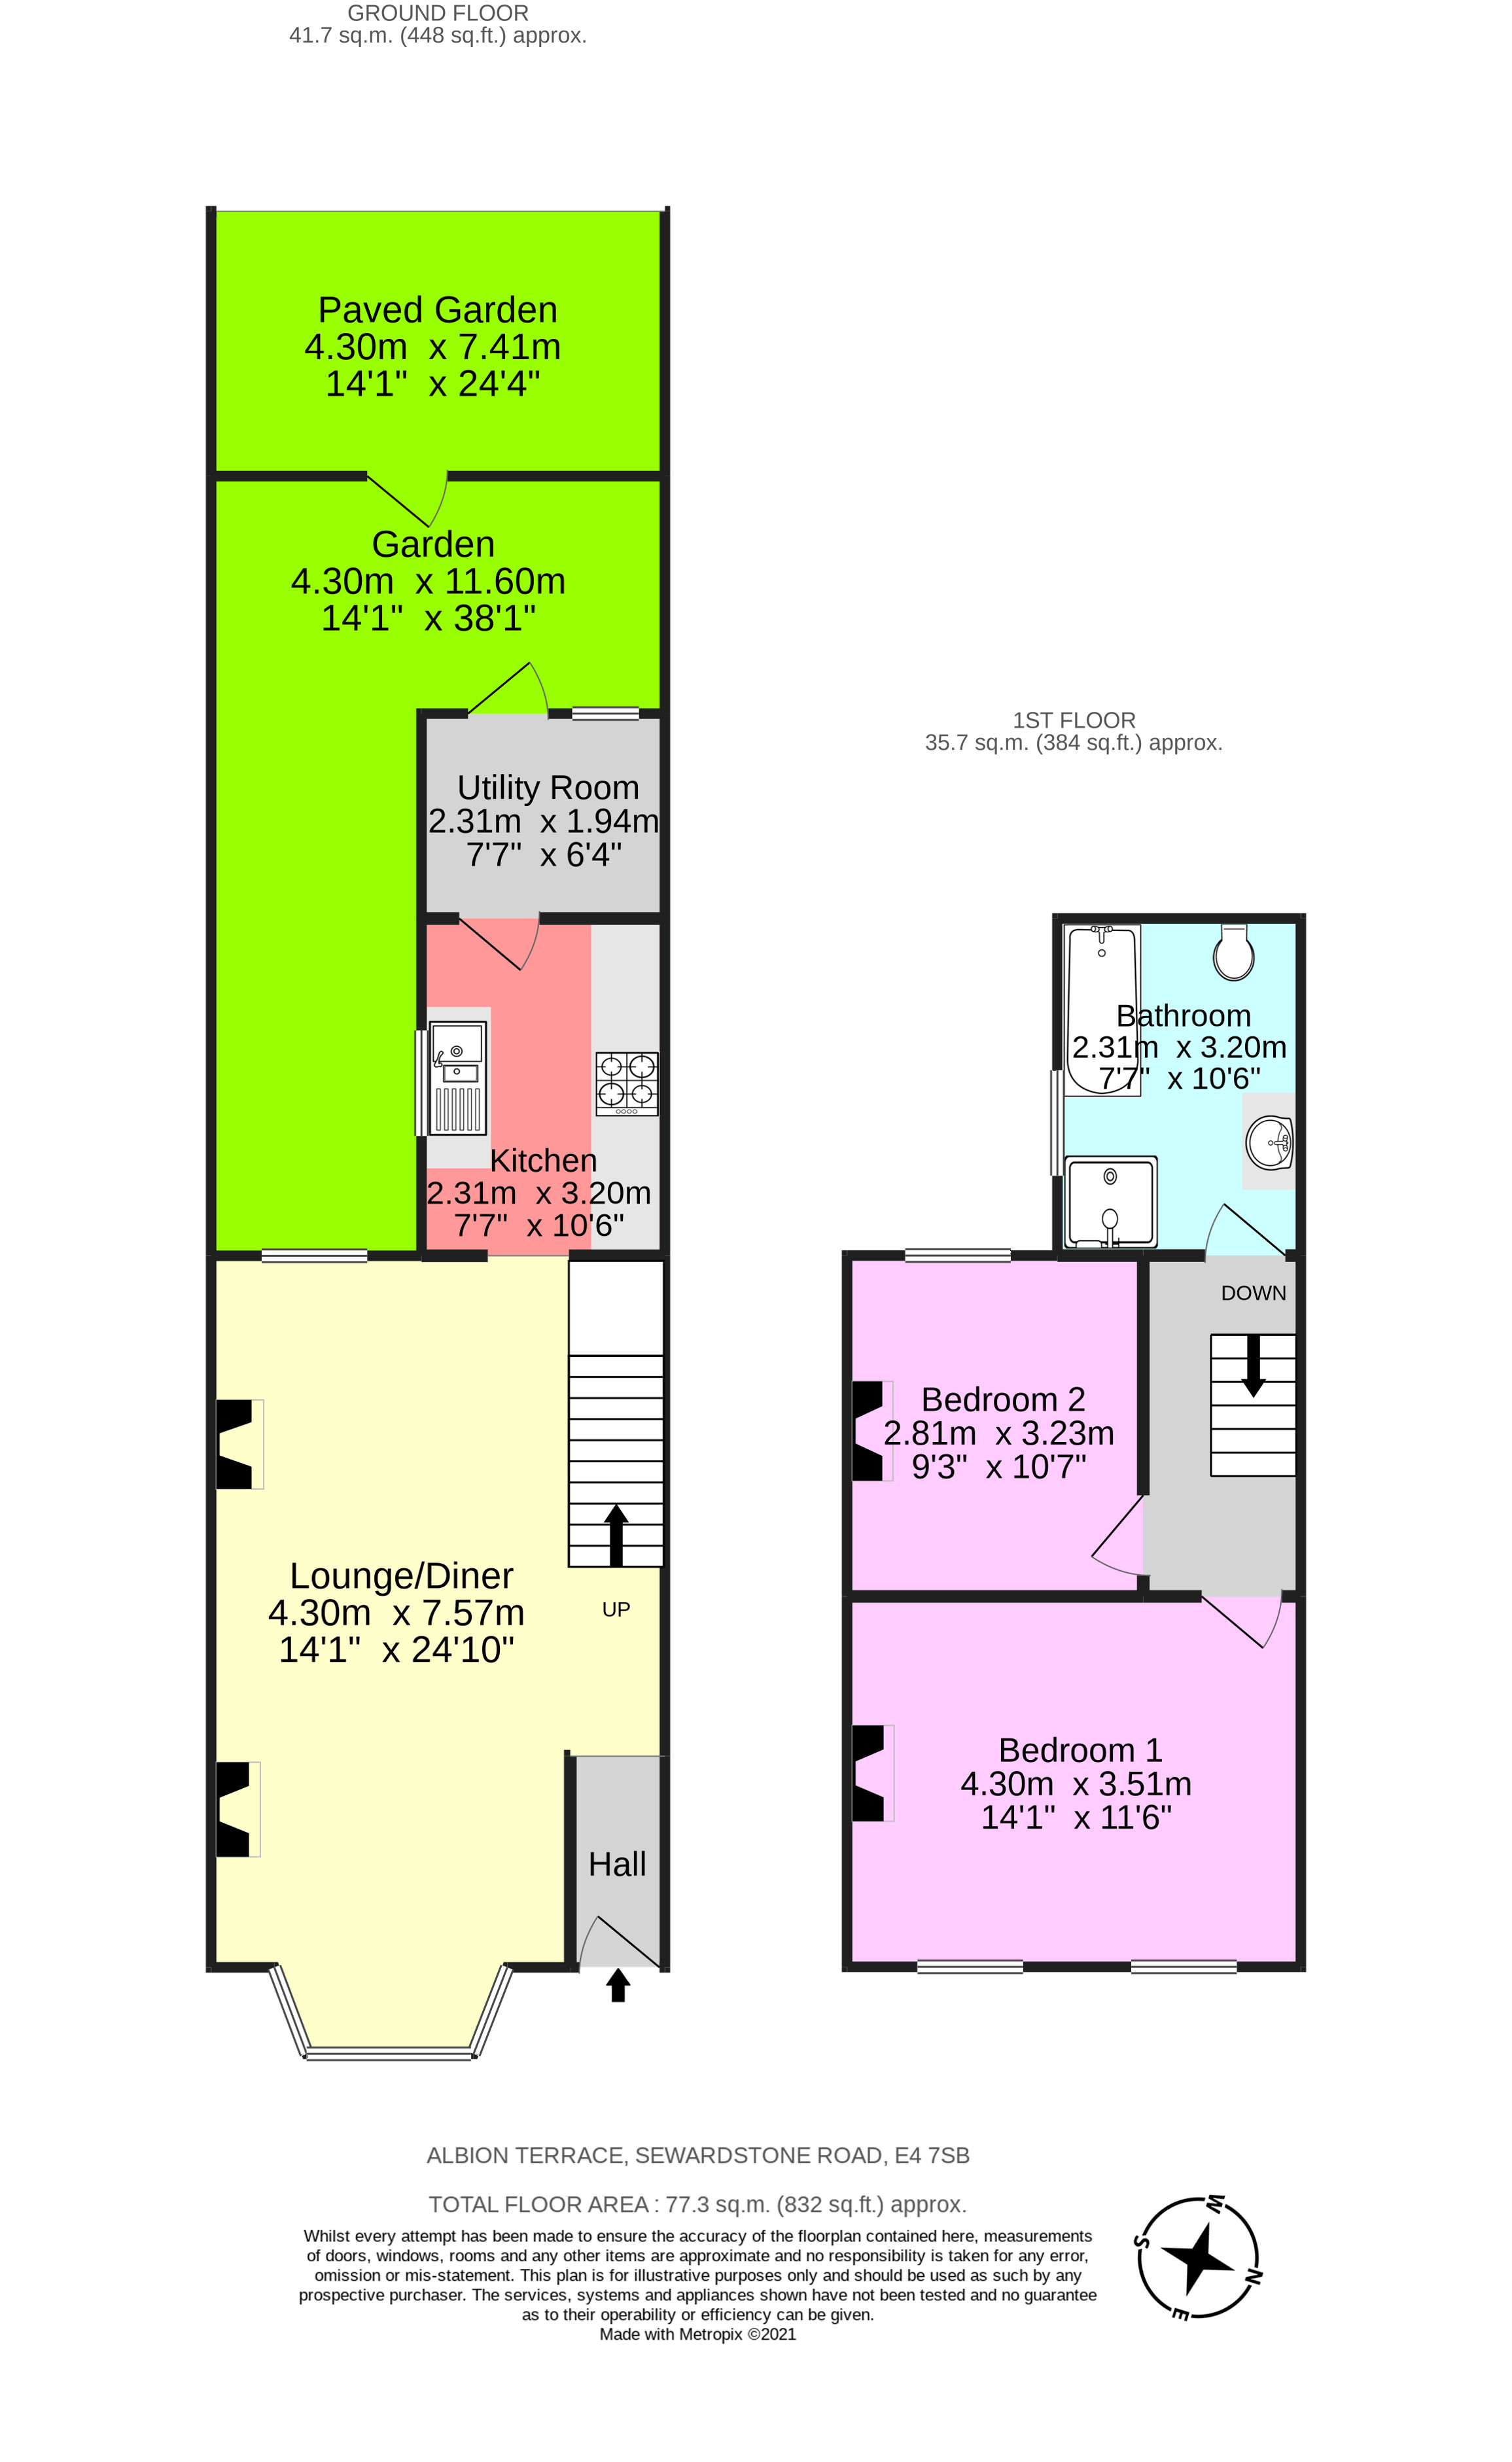 customer_1/branch_3/client_46541/sale_property/13AlbionTerraceSewar_1631792139.jpeg